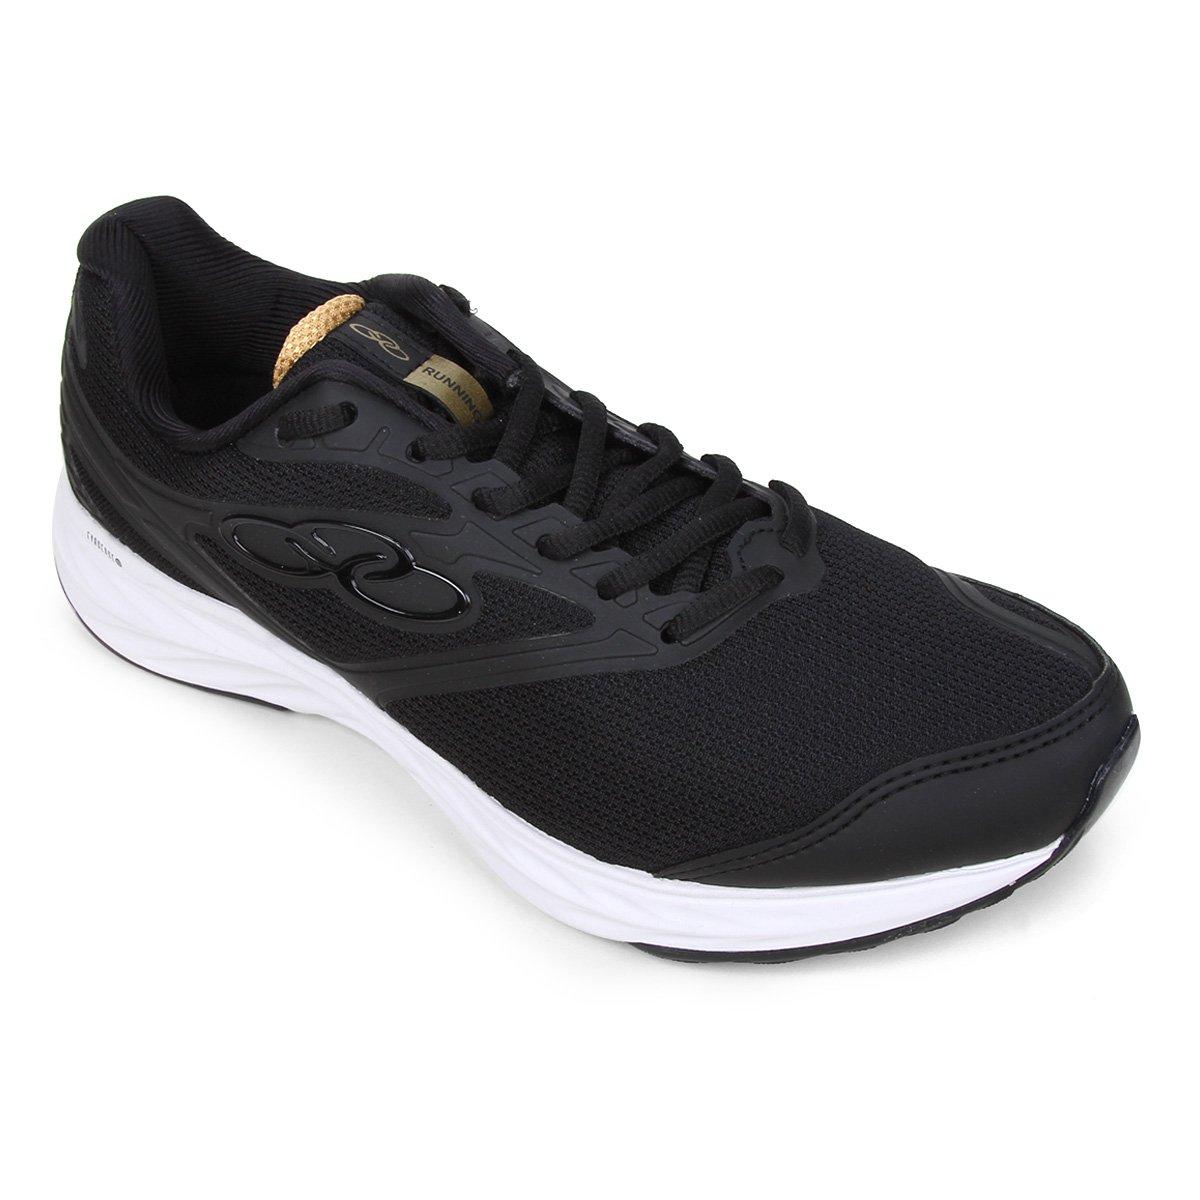 tenis olympikus - Netshoes - Tênis Olympikus Storm - R$99,99